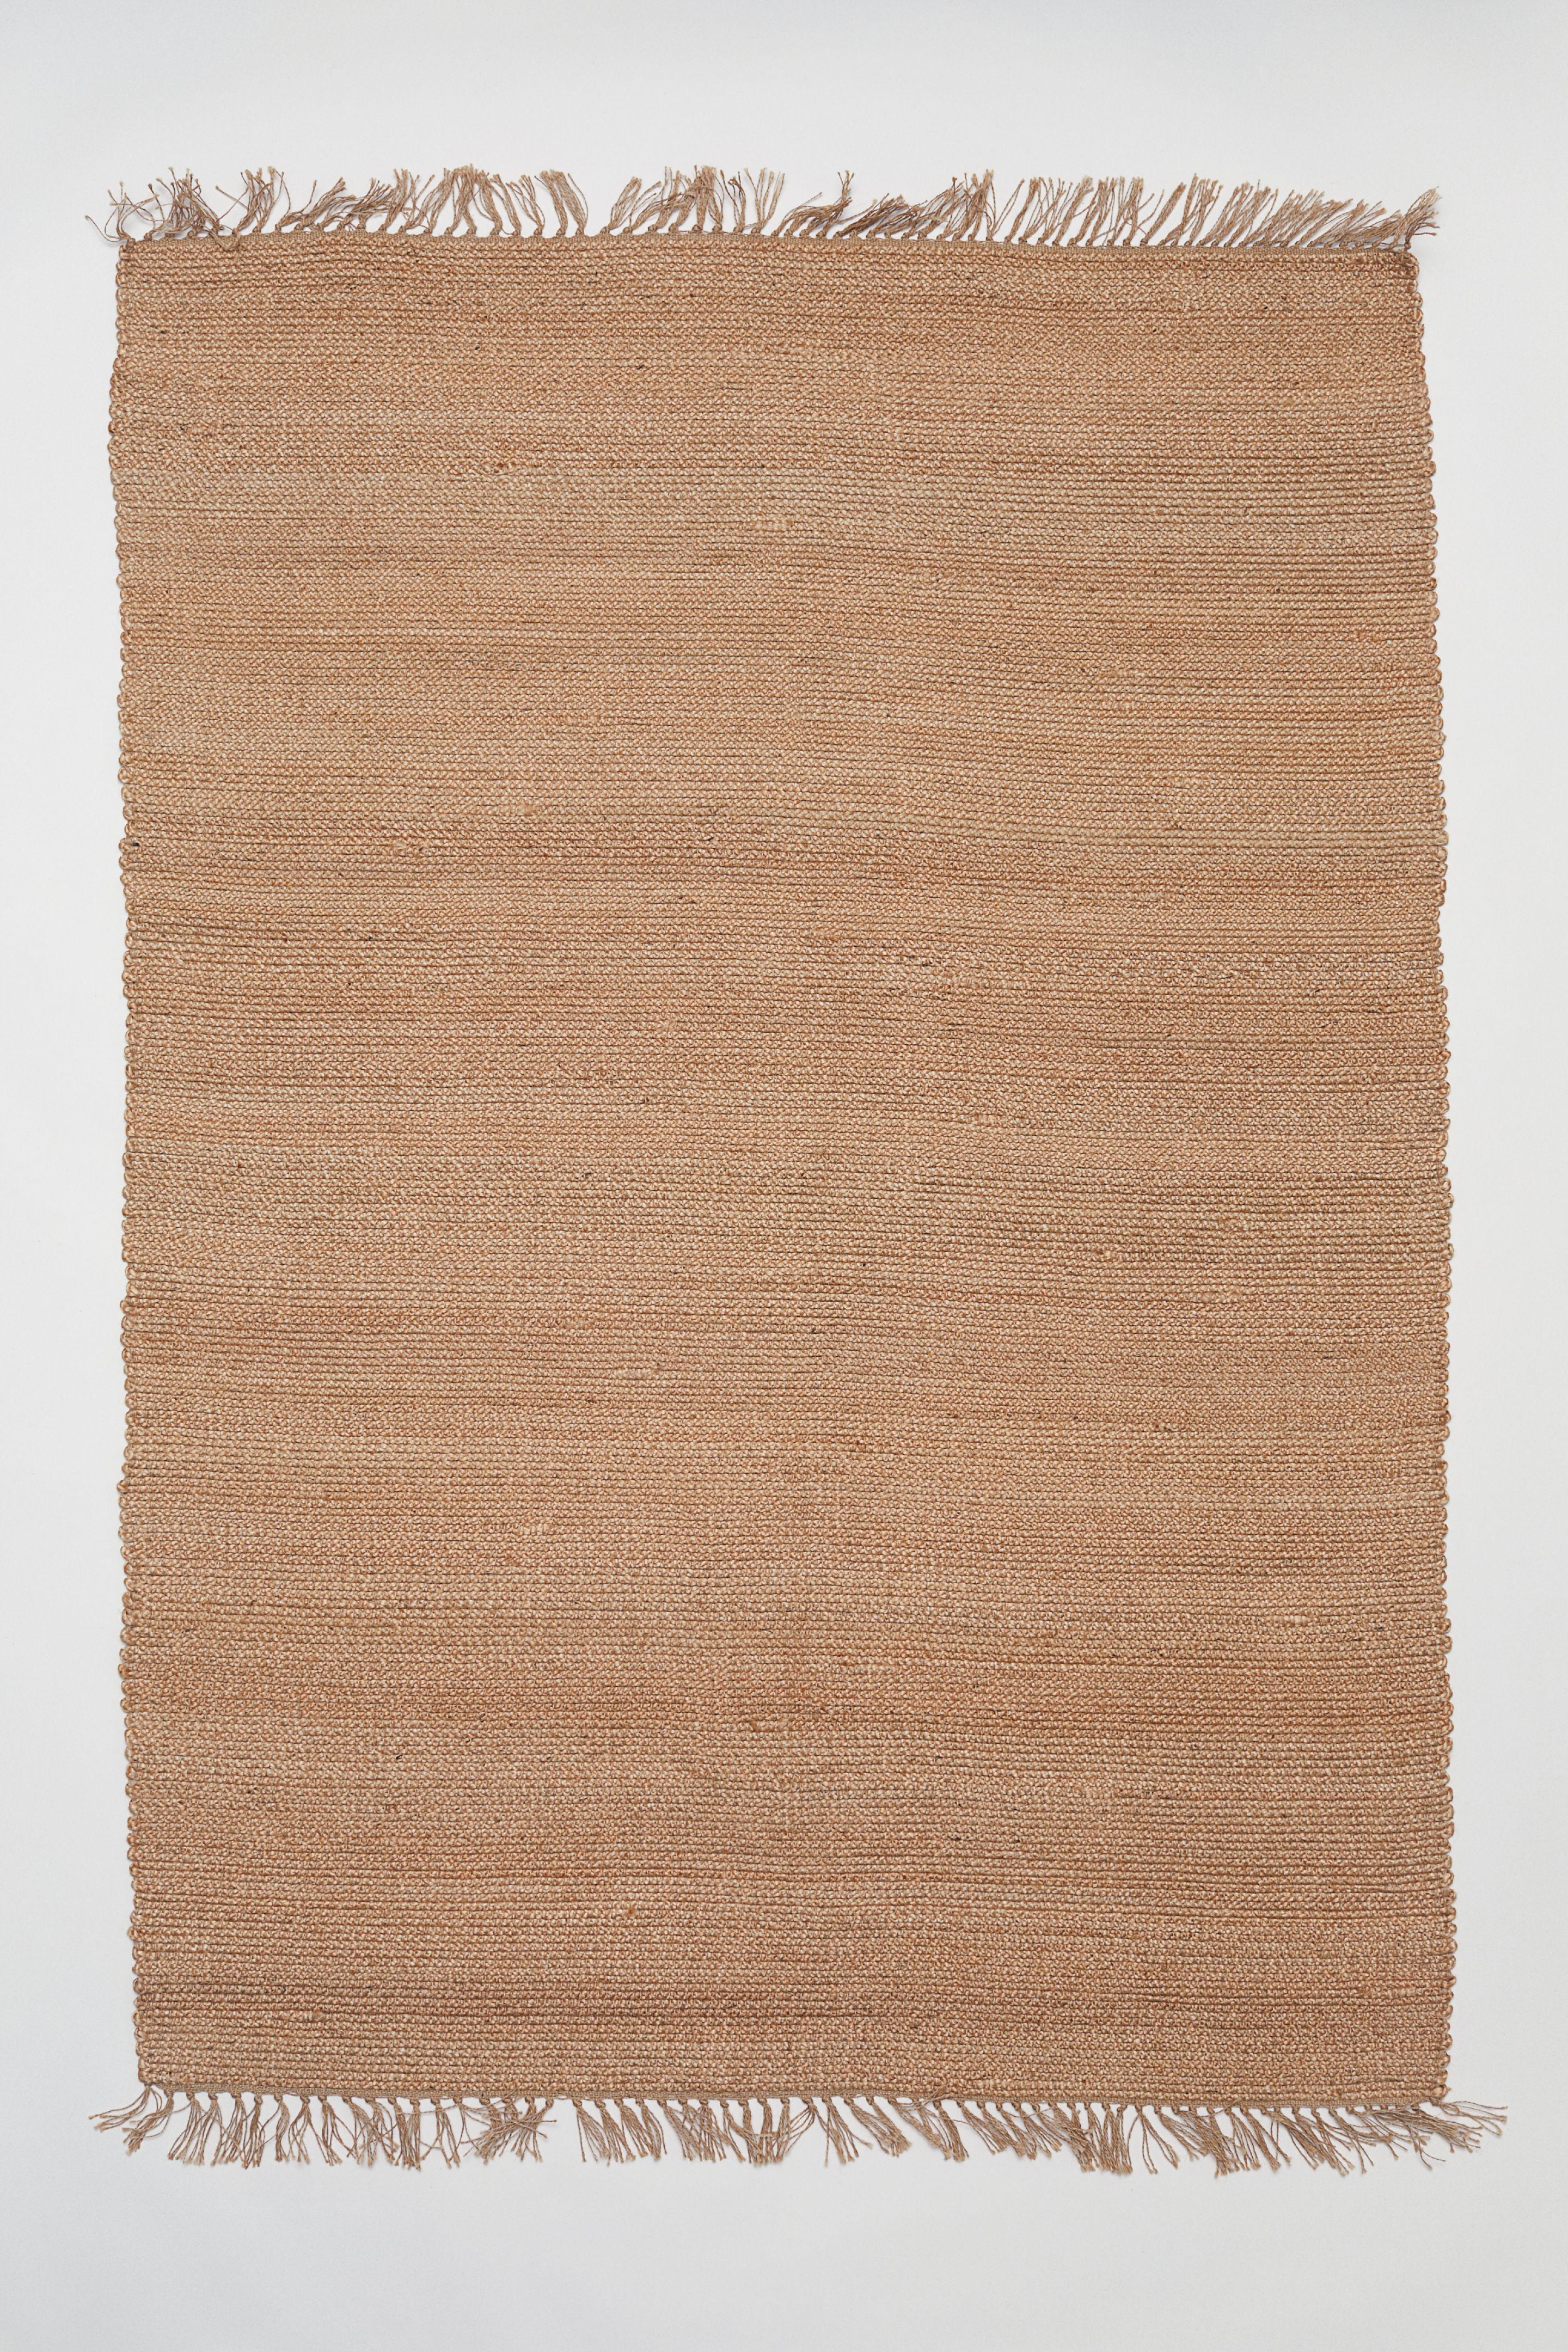 rugs under £100